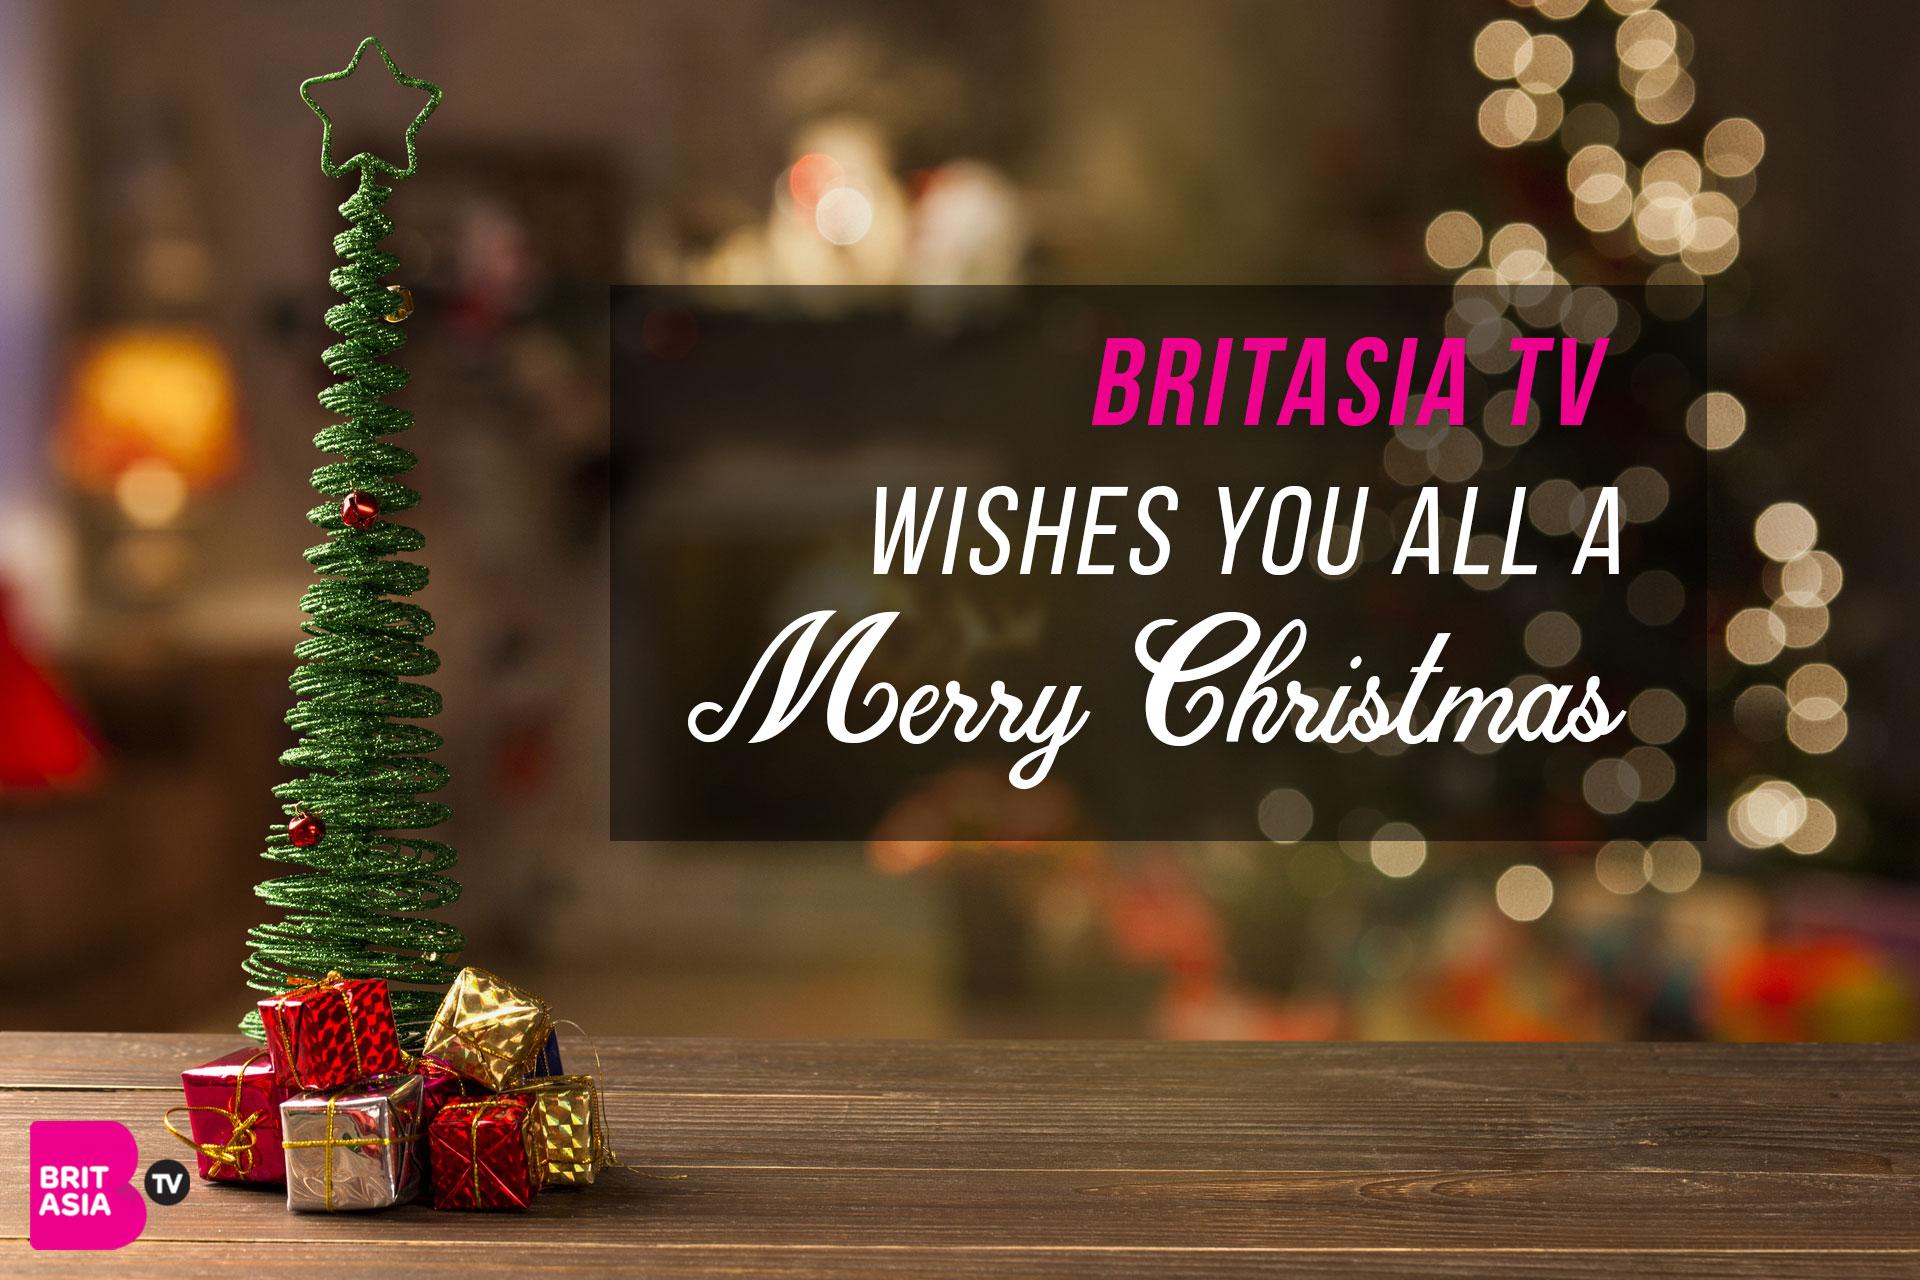 BRITASIA TV CHRISTMAS MESSAGE